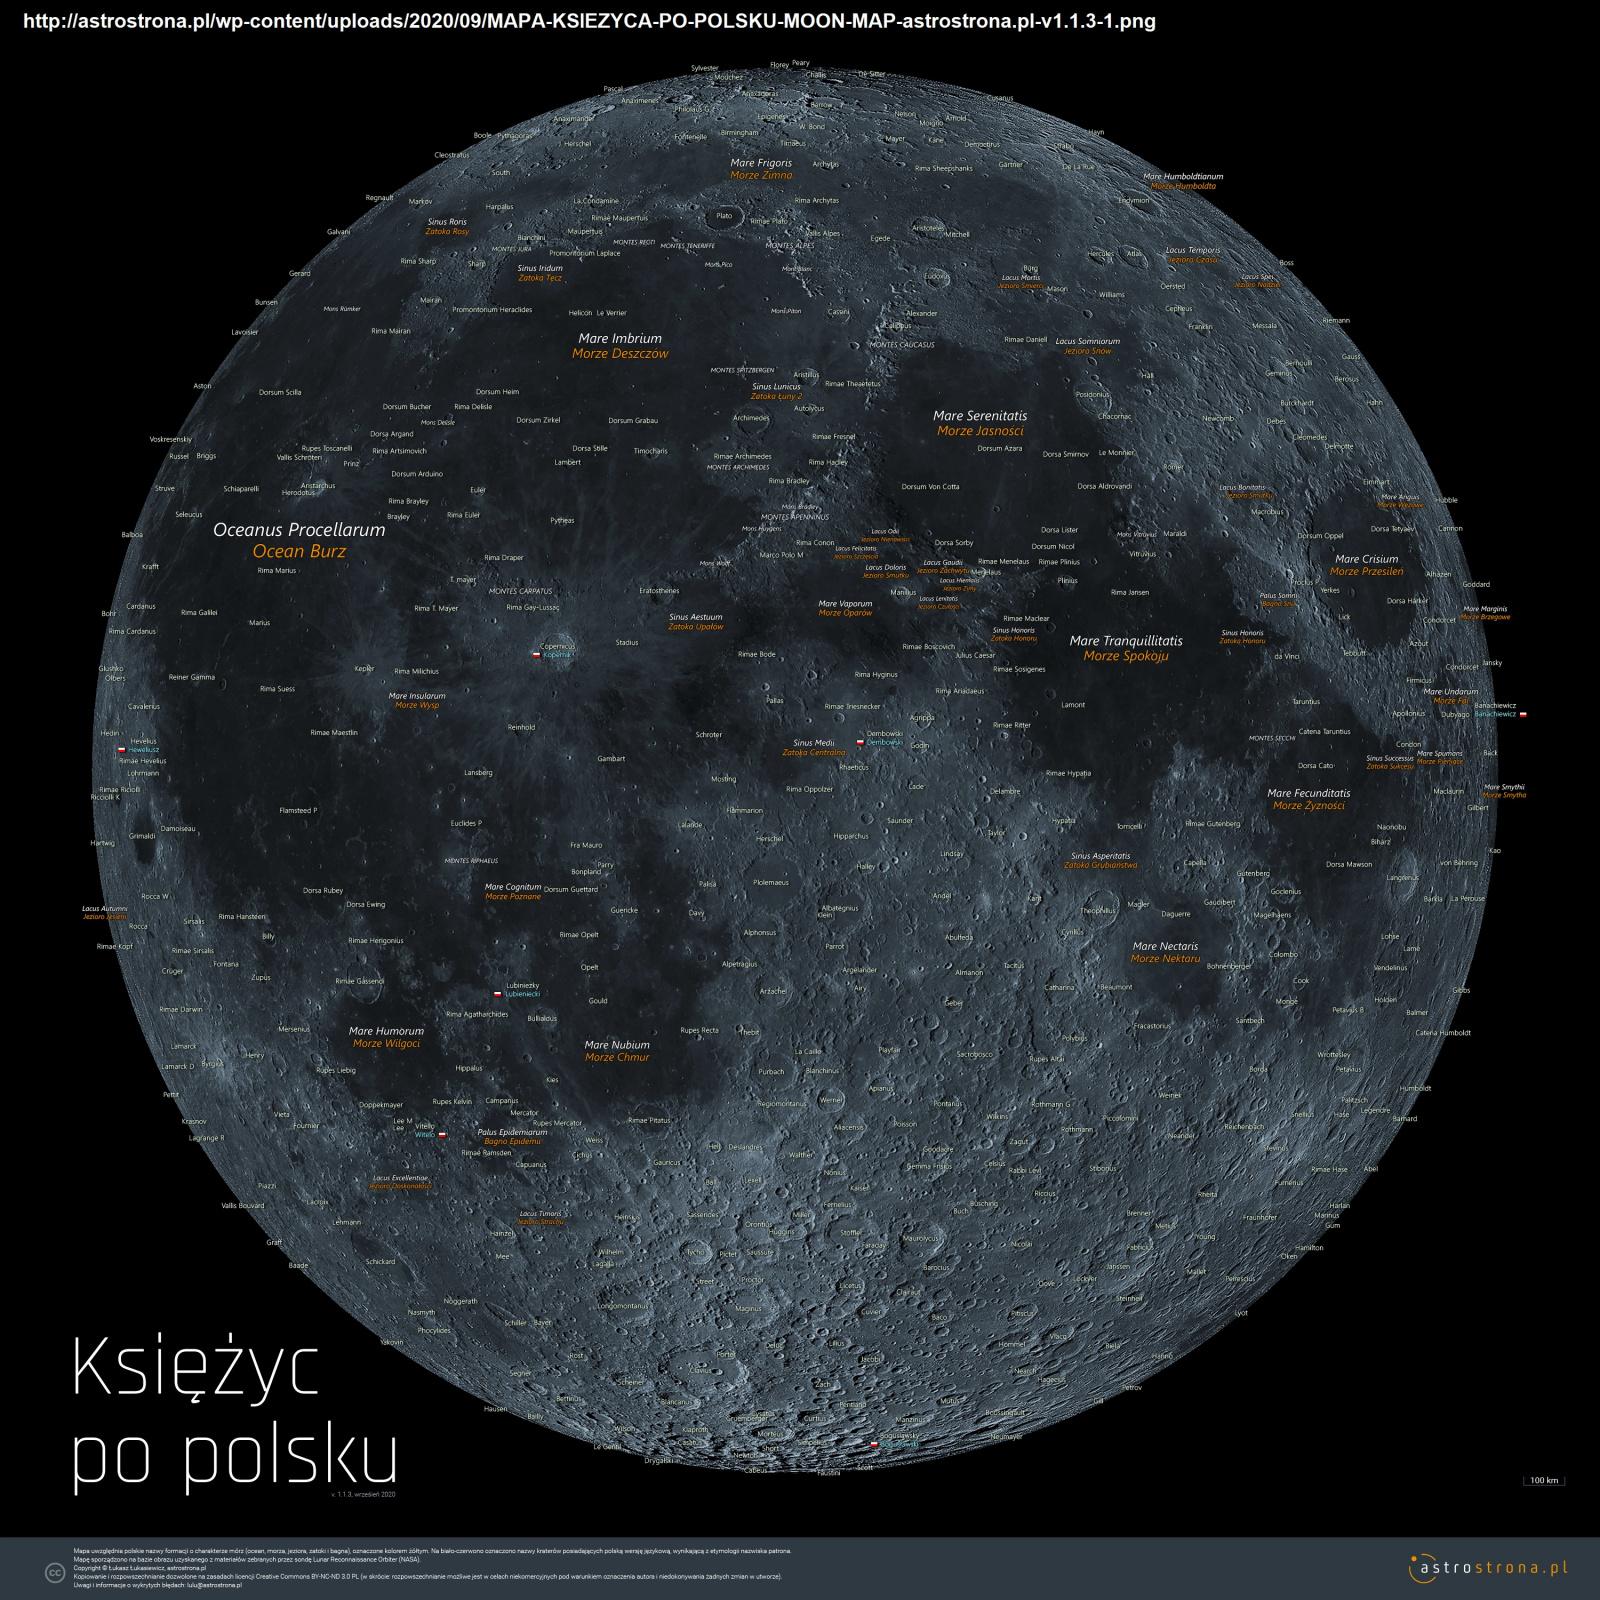 ksiezyc_pol.jpg